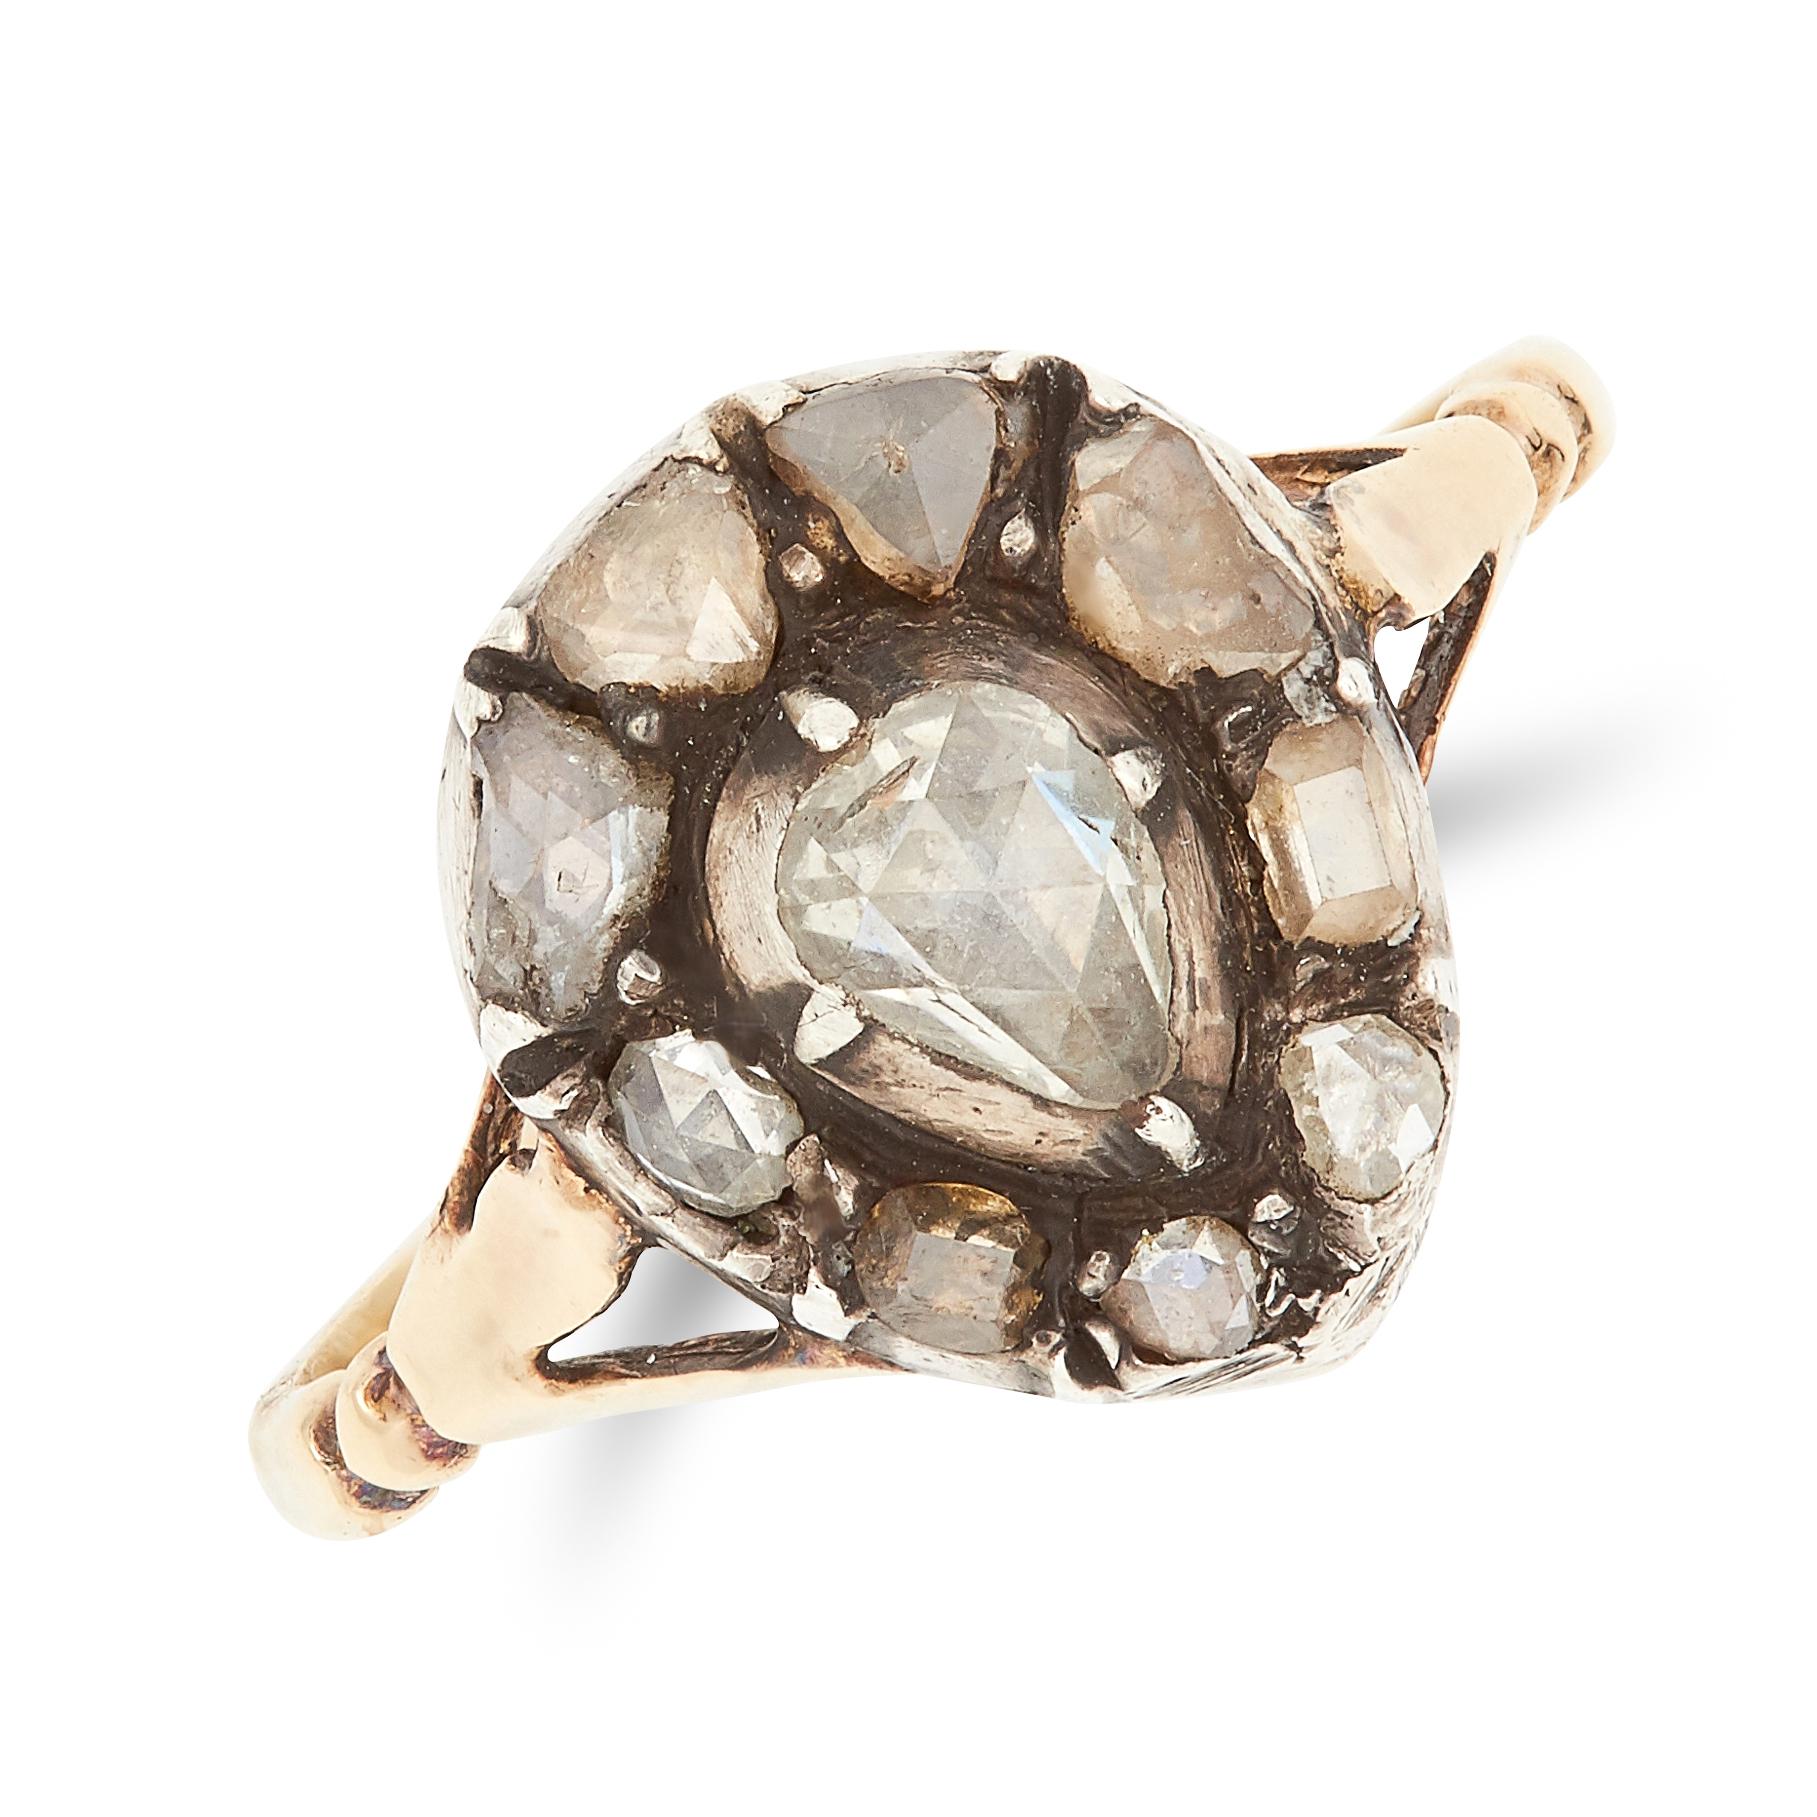 ANTIQUE GEORGIAN DIAMOND RING set with rose cut diamonds in foliate design, size M / 6, 2.3g.